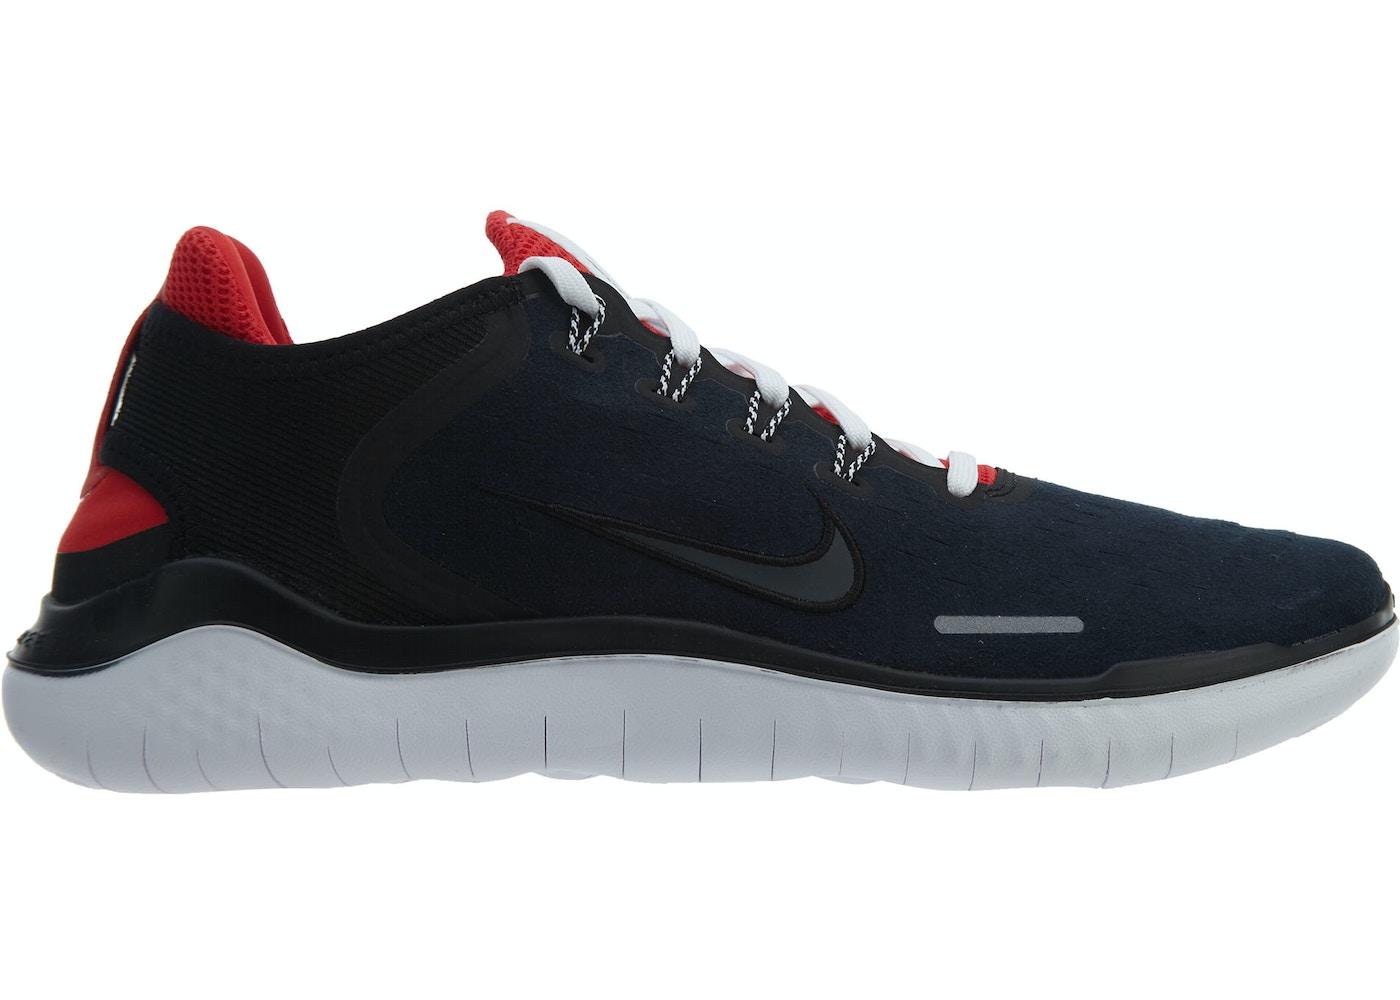 Nike Free Rn 2018 Dna Black Anthracite-Speed Red - AH7870-001 b9adf843b